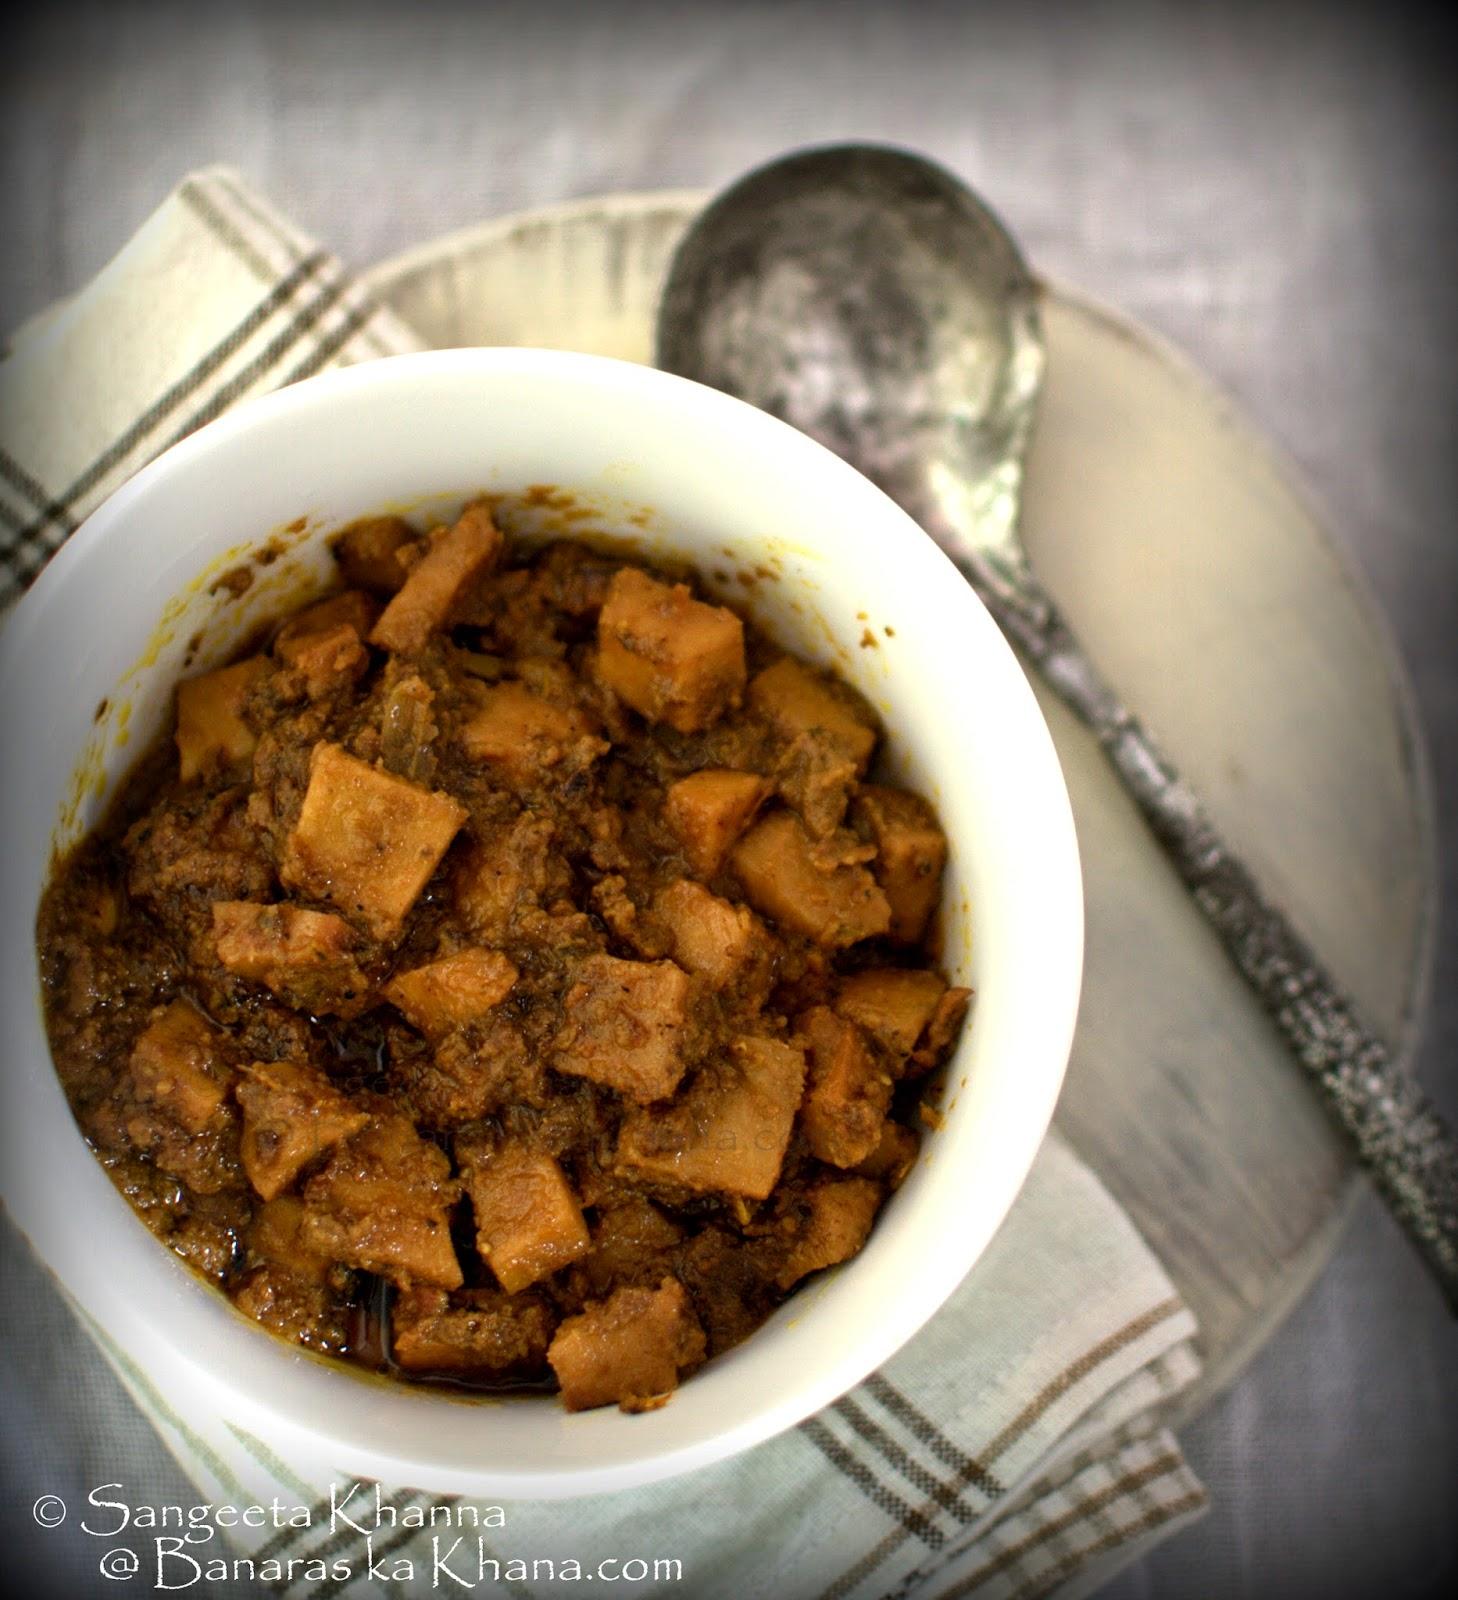 sooran ki subzi for diwali : the tradition of eating sooran on diwali